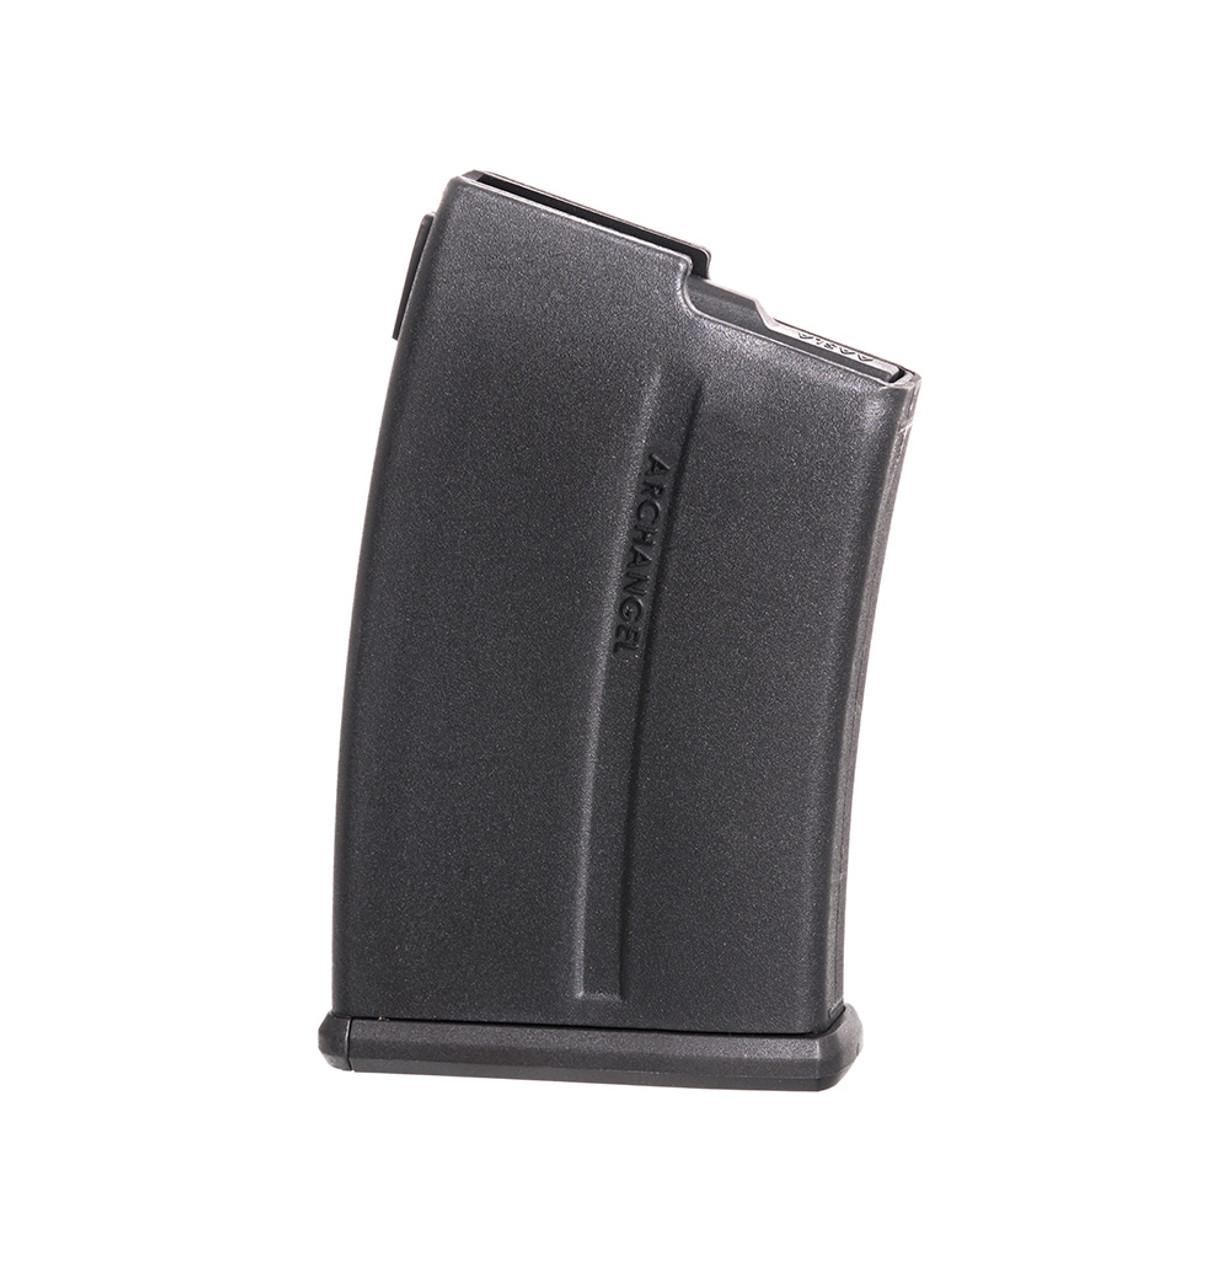 Archangel® Magnum Caliber .300 WIN, 7mm Rem Magnum TYPE C Magazine for the AA700MLA & AA1500MLA Stocks (17) Rd - Black Polymer